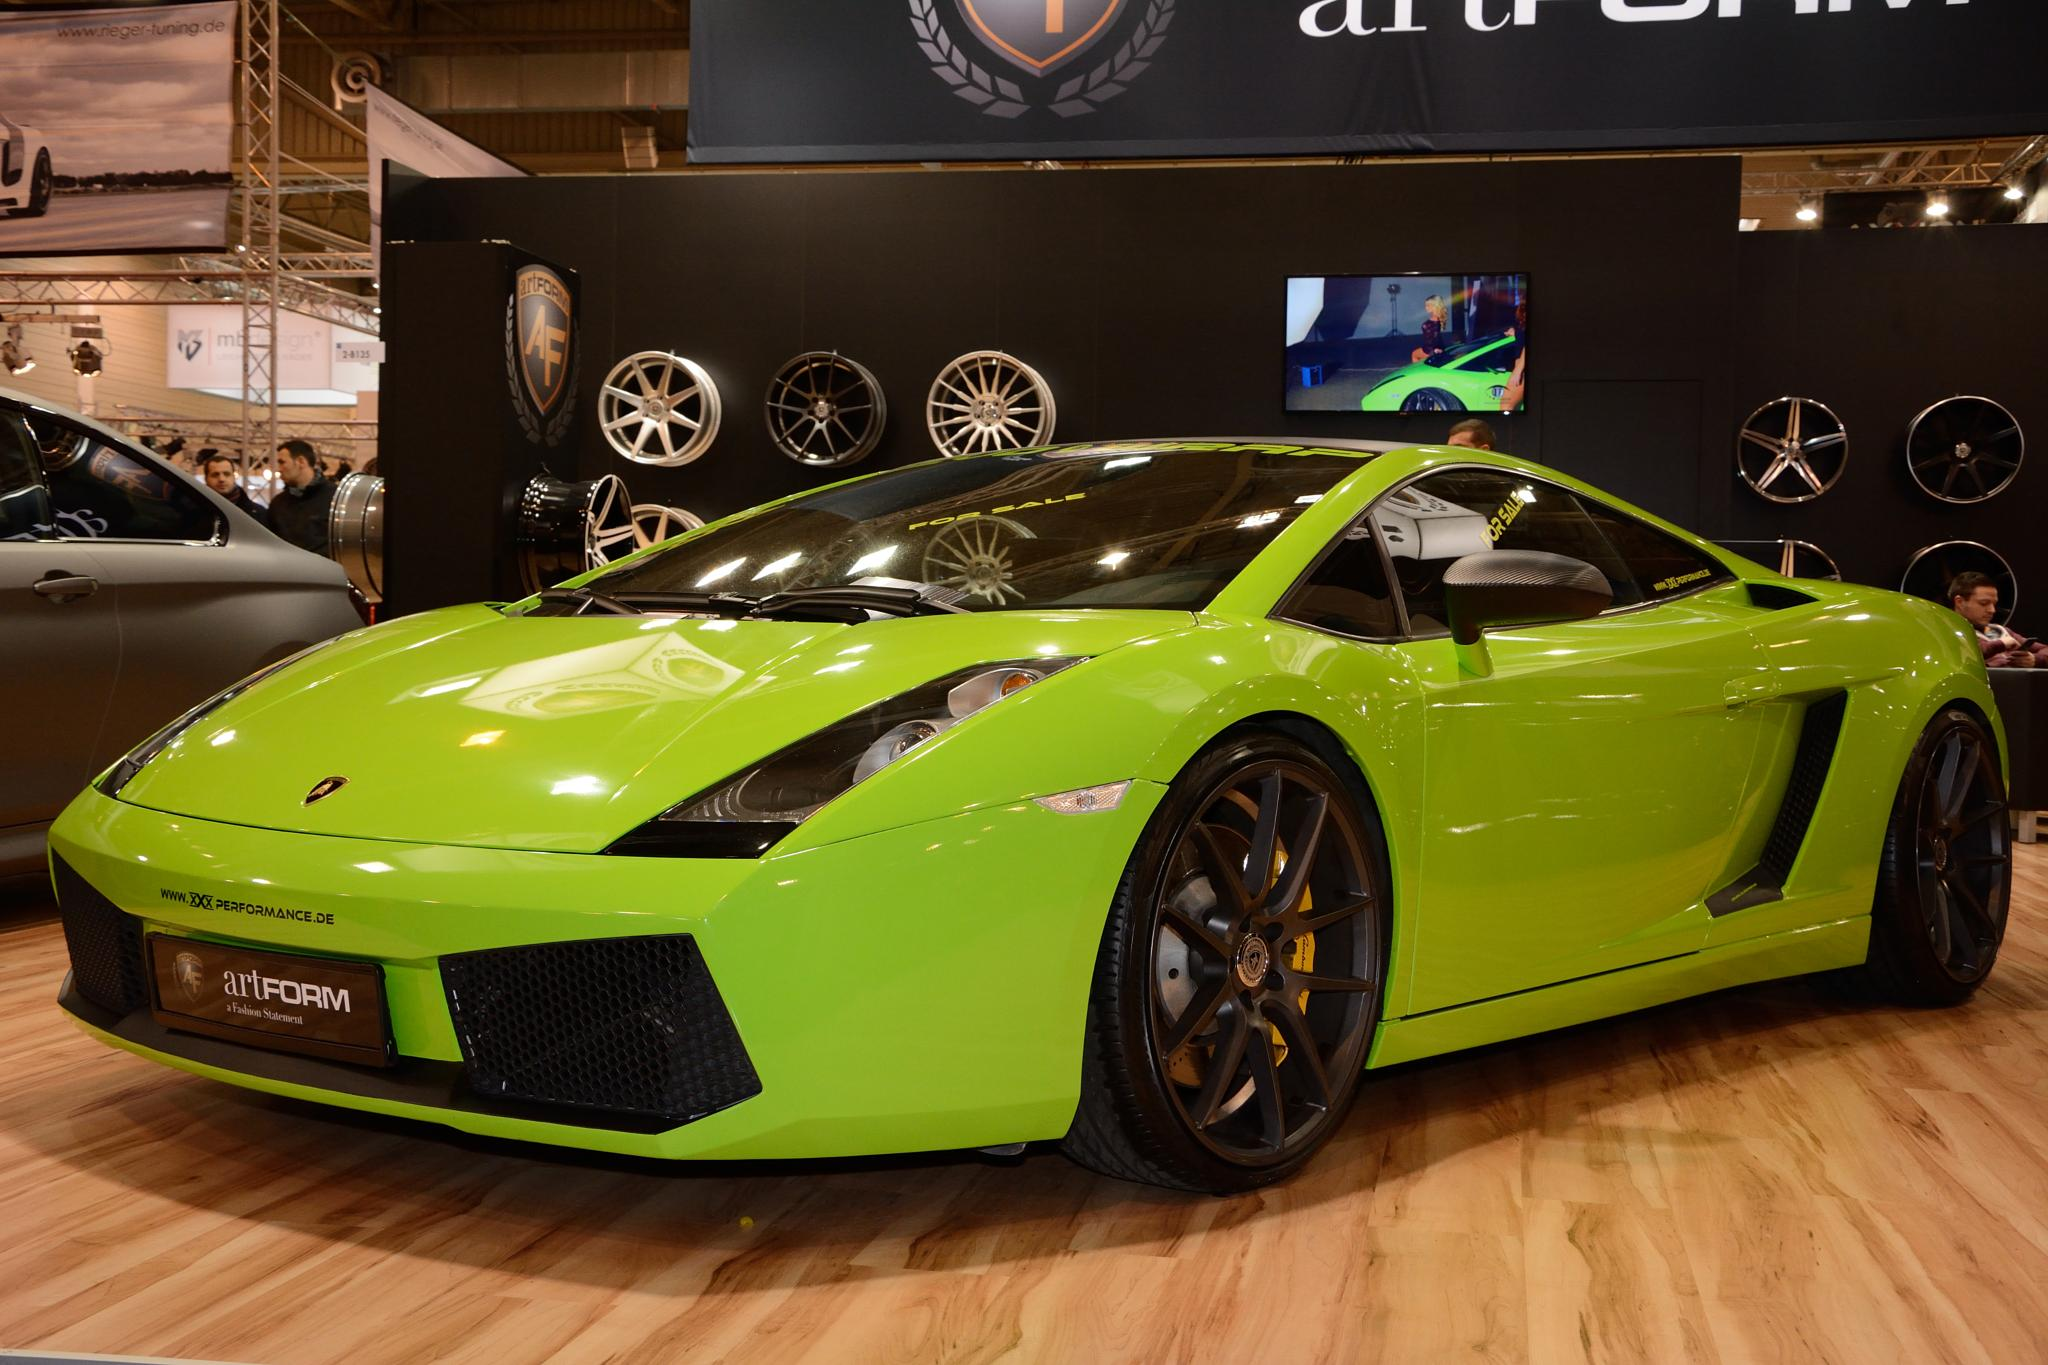 Lamborghini at Essen Motor Show 2014 by Wim Byl